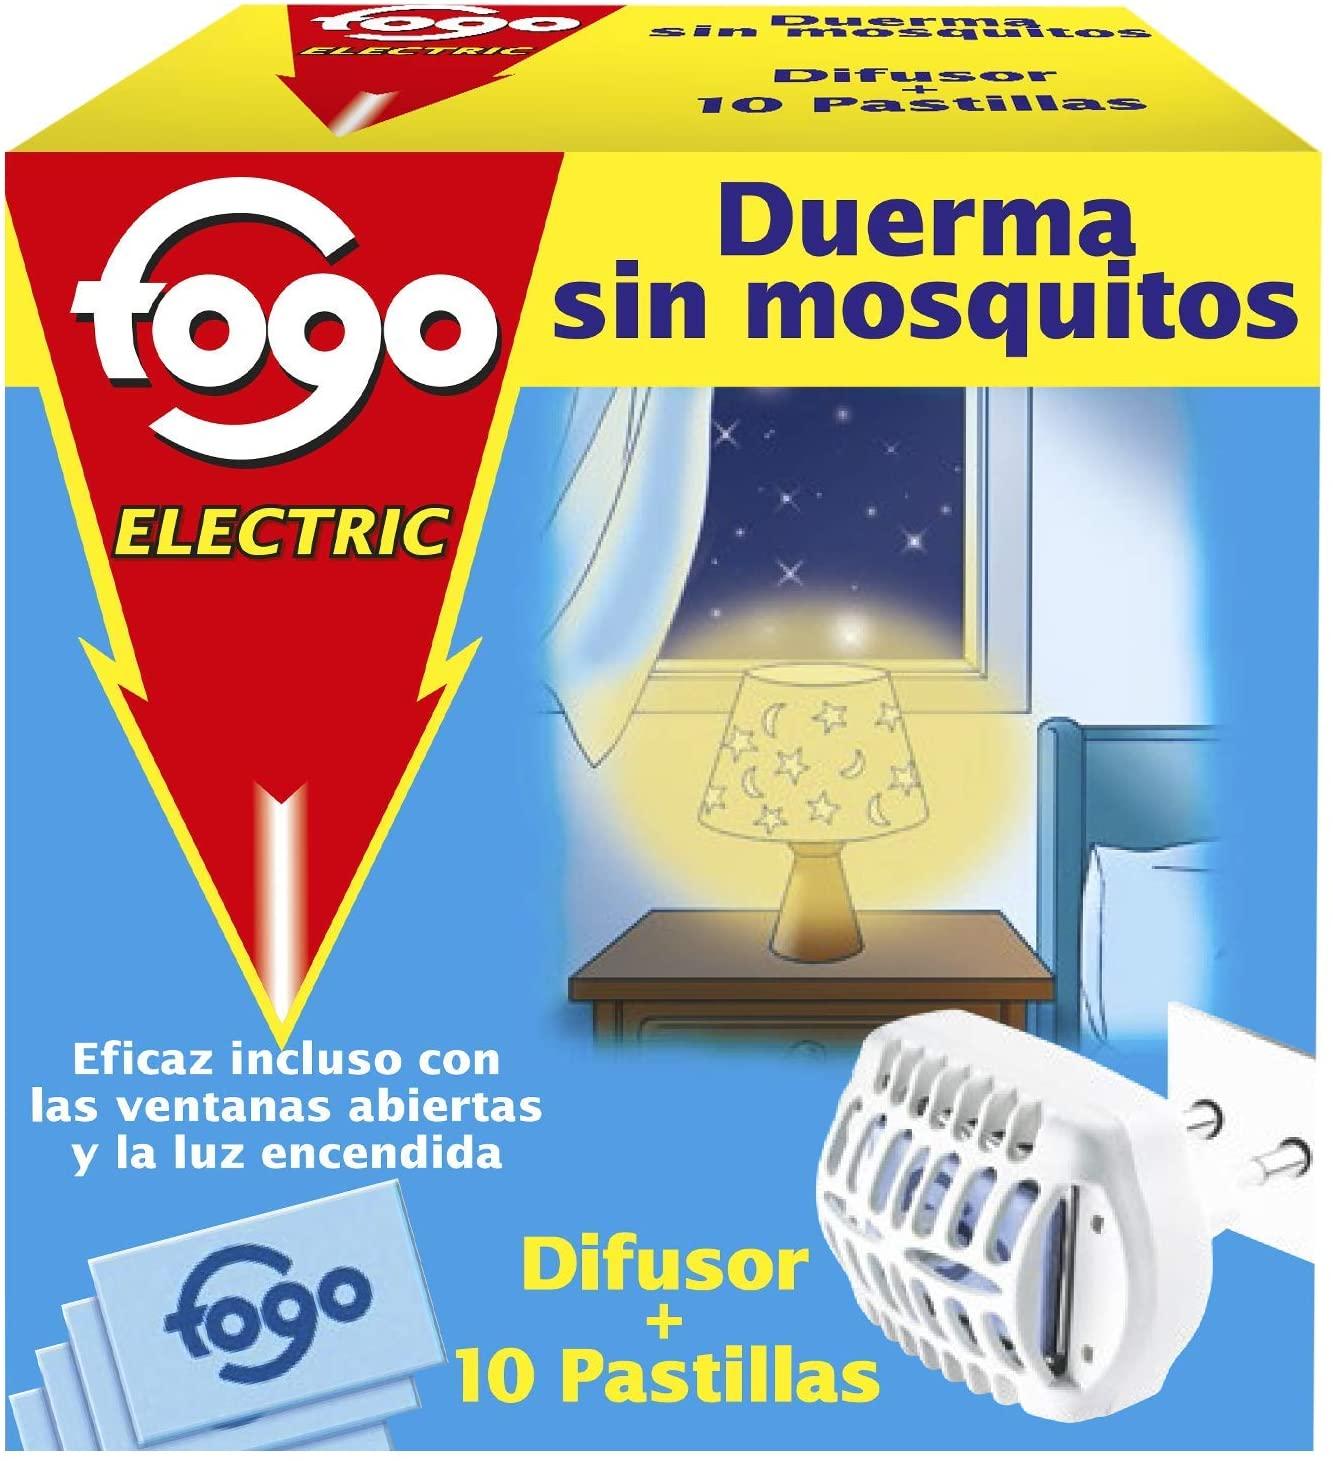 Fogo Mosquito Diffuser + 10 Inserts